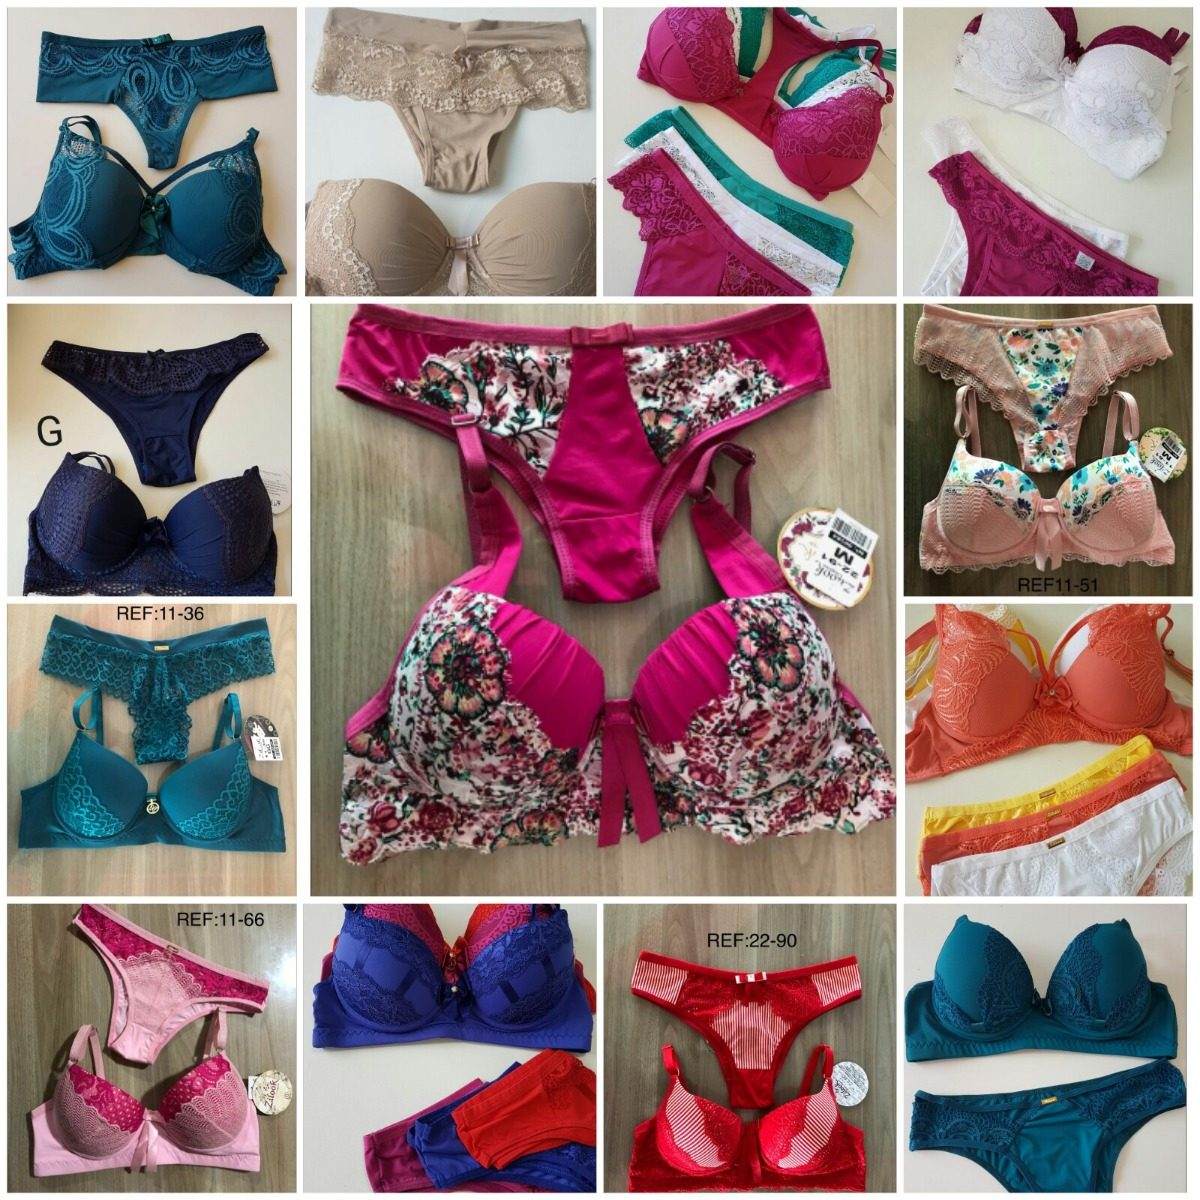 4c8d6c34568c6 lingerie luxo atacado kit 25 conjuntos de lingerie c  bojo. Carregando zoom.